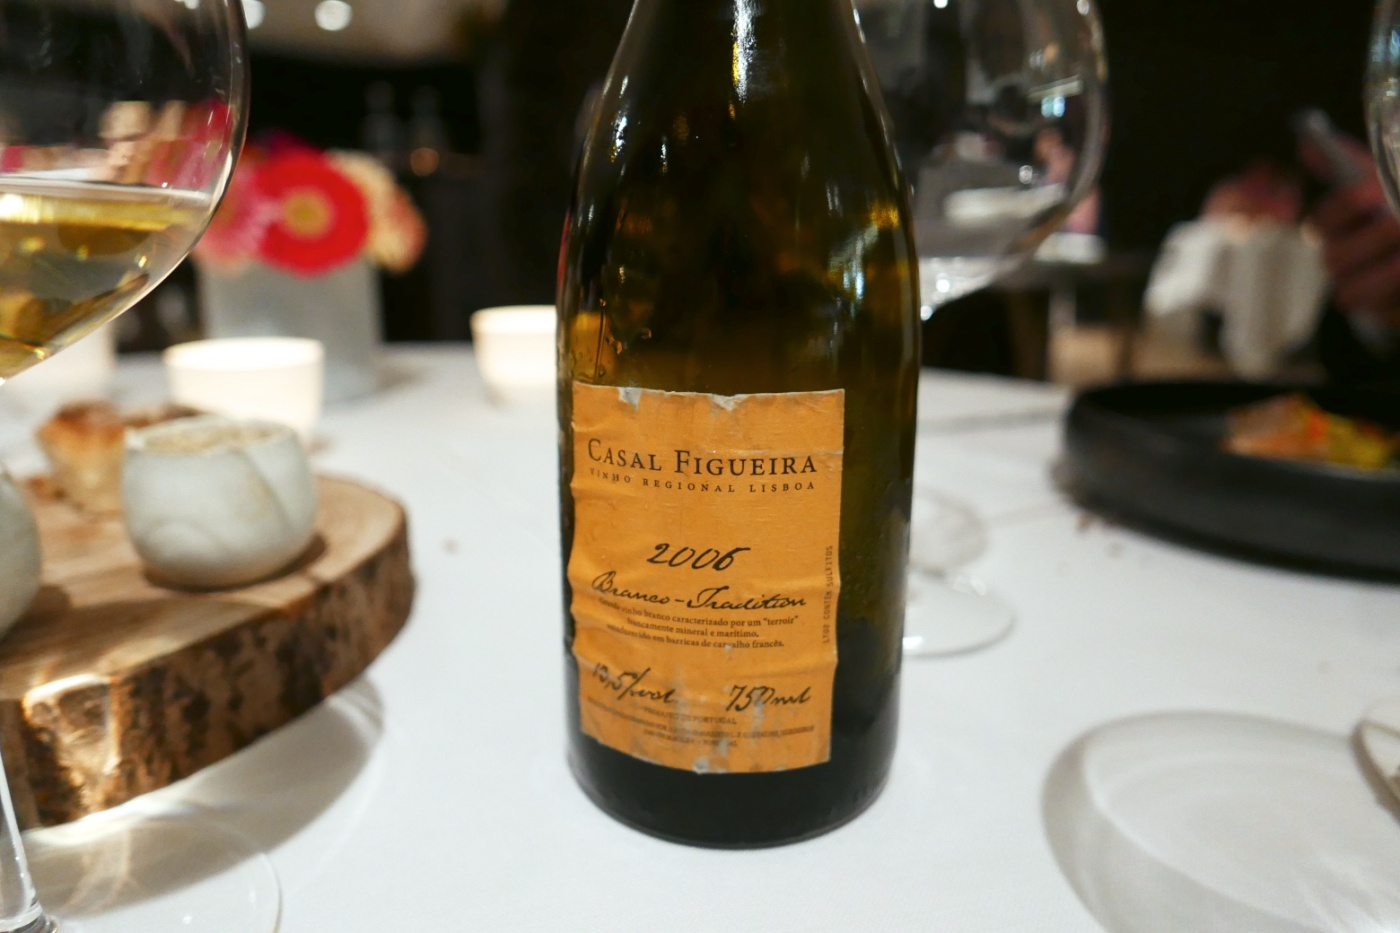 2016 Casal Figueira 'Antonio' Branco, Vinho Regional Lisboa, Portugal